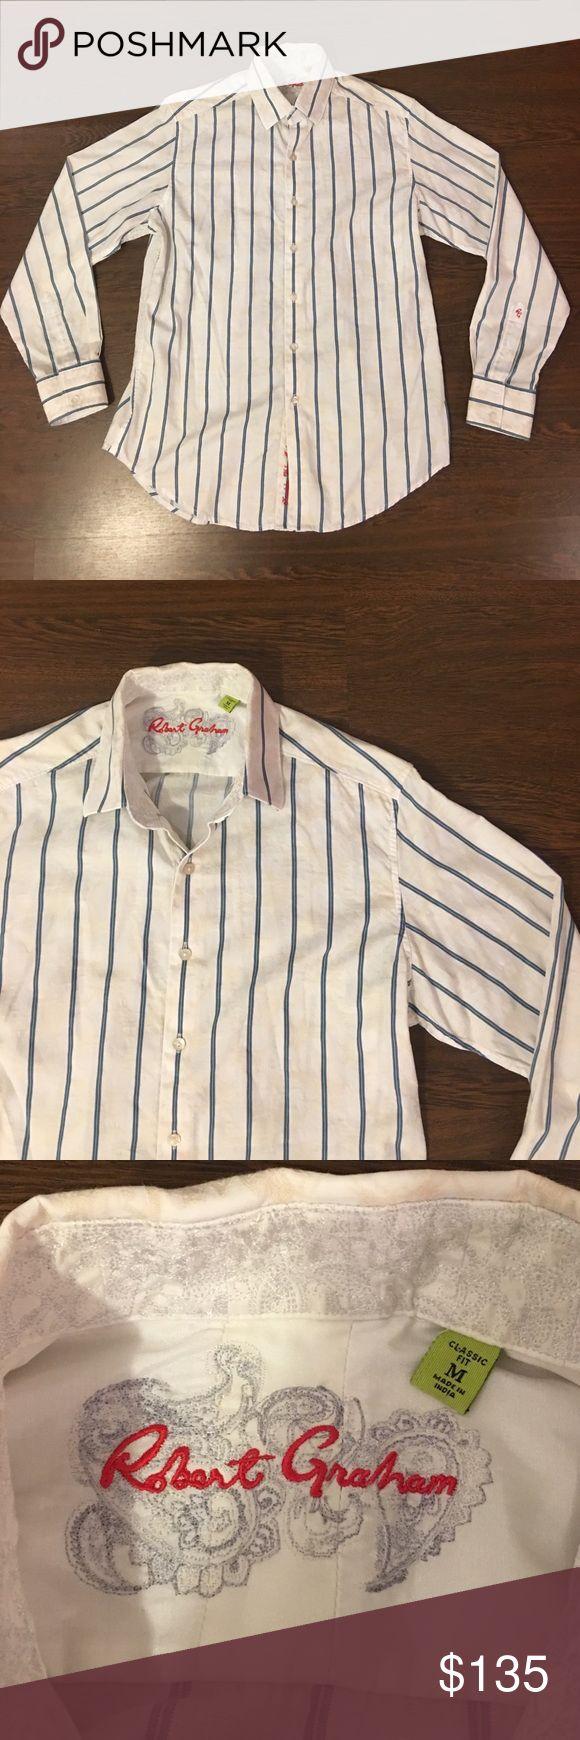 Robert Graham Handmade Button Down Shirt (Medium) Robert Graham Button Down Shirt. Handmade Limited Edition Dress Shirt. Lightly Worn. In Great Pre Owned Condition. Robert Graham Shirts Casual Button Down Shirts